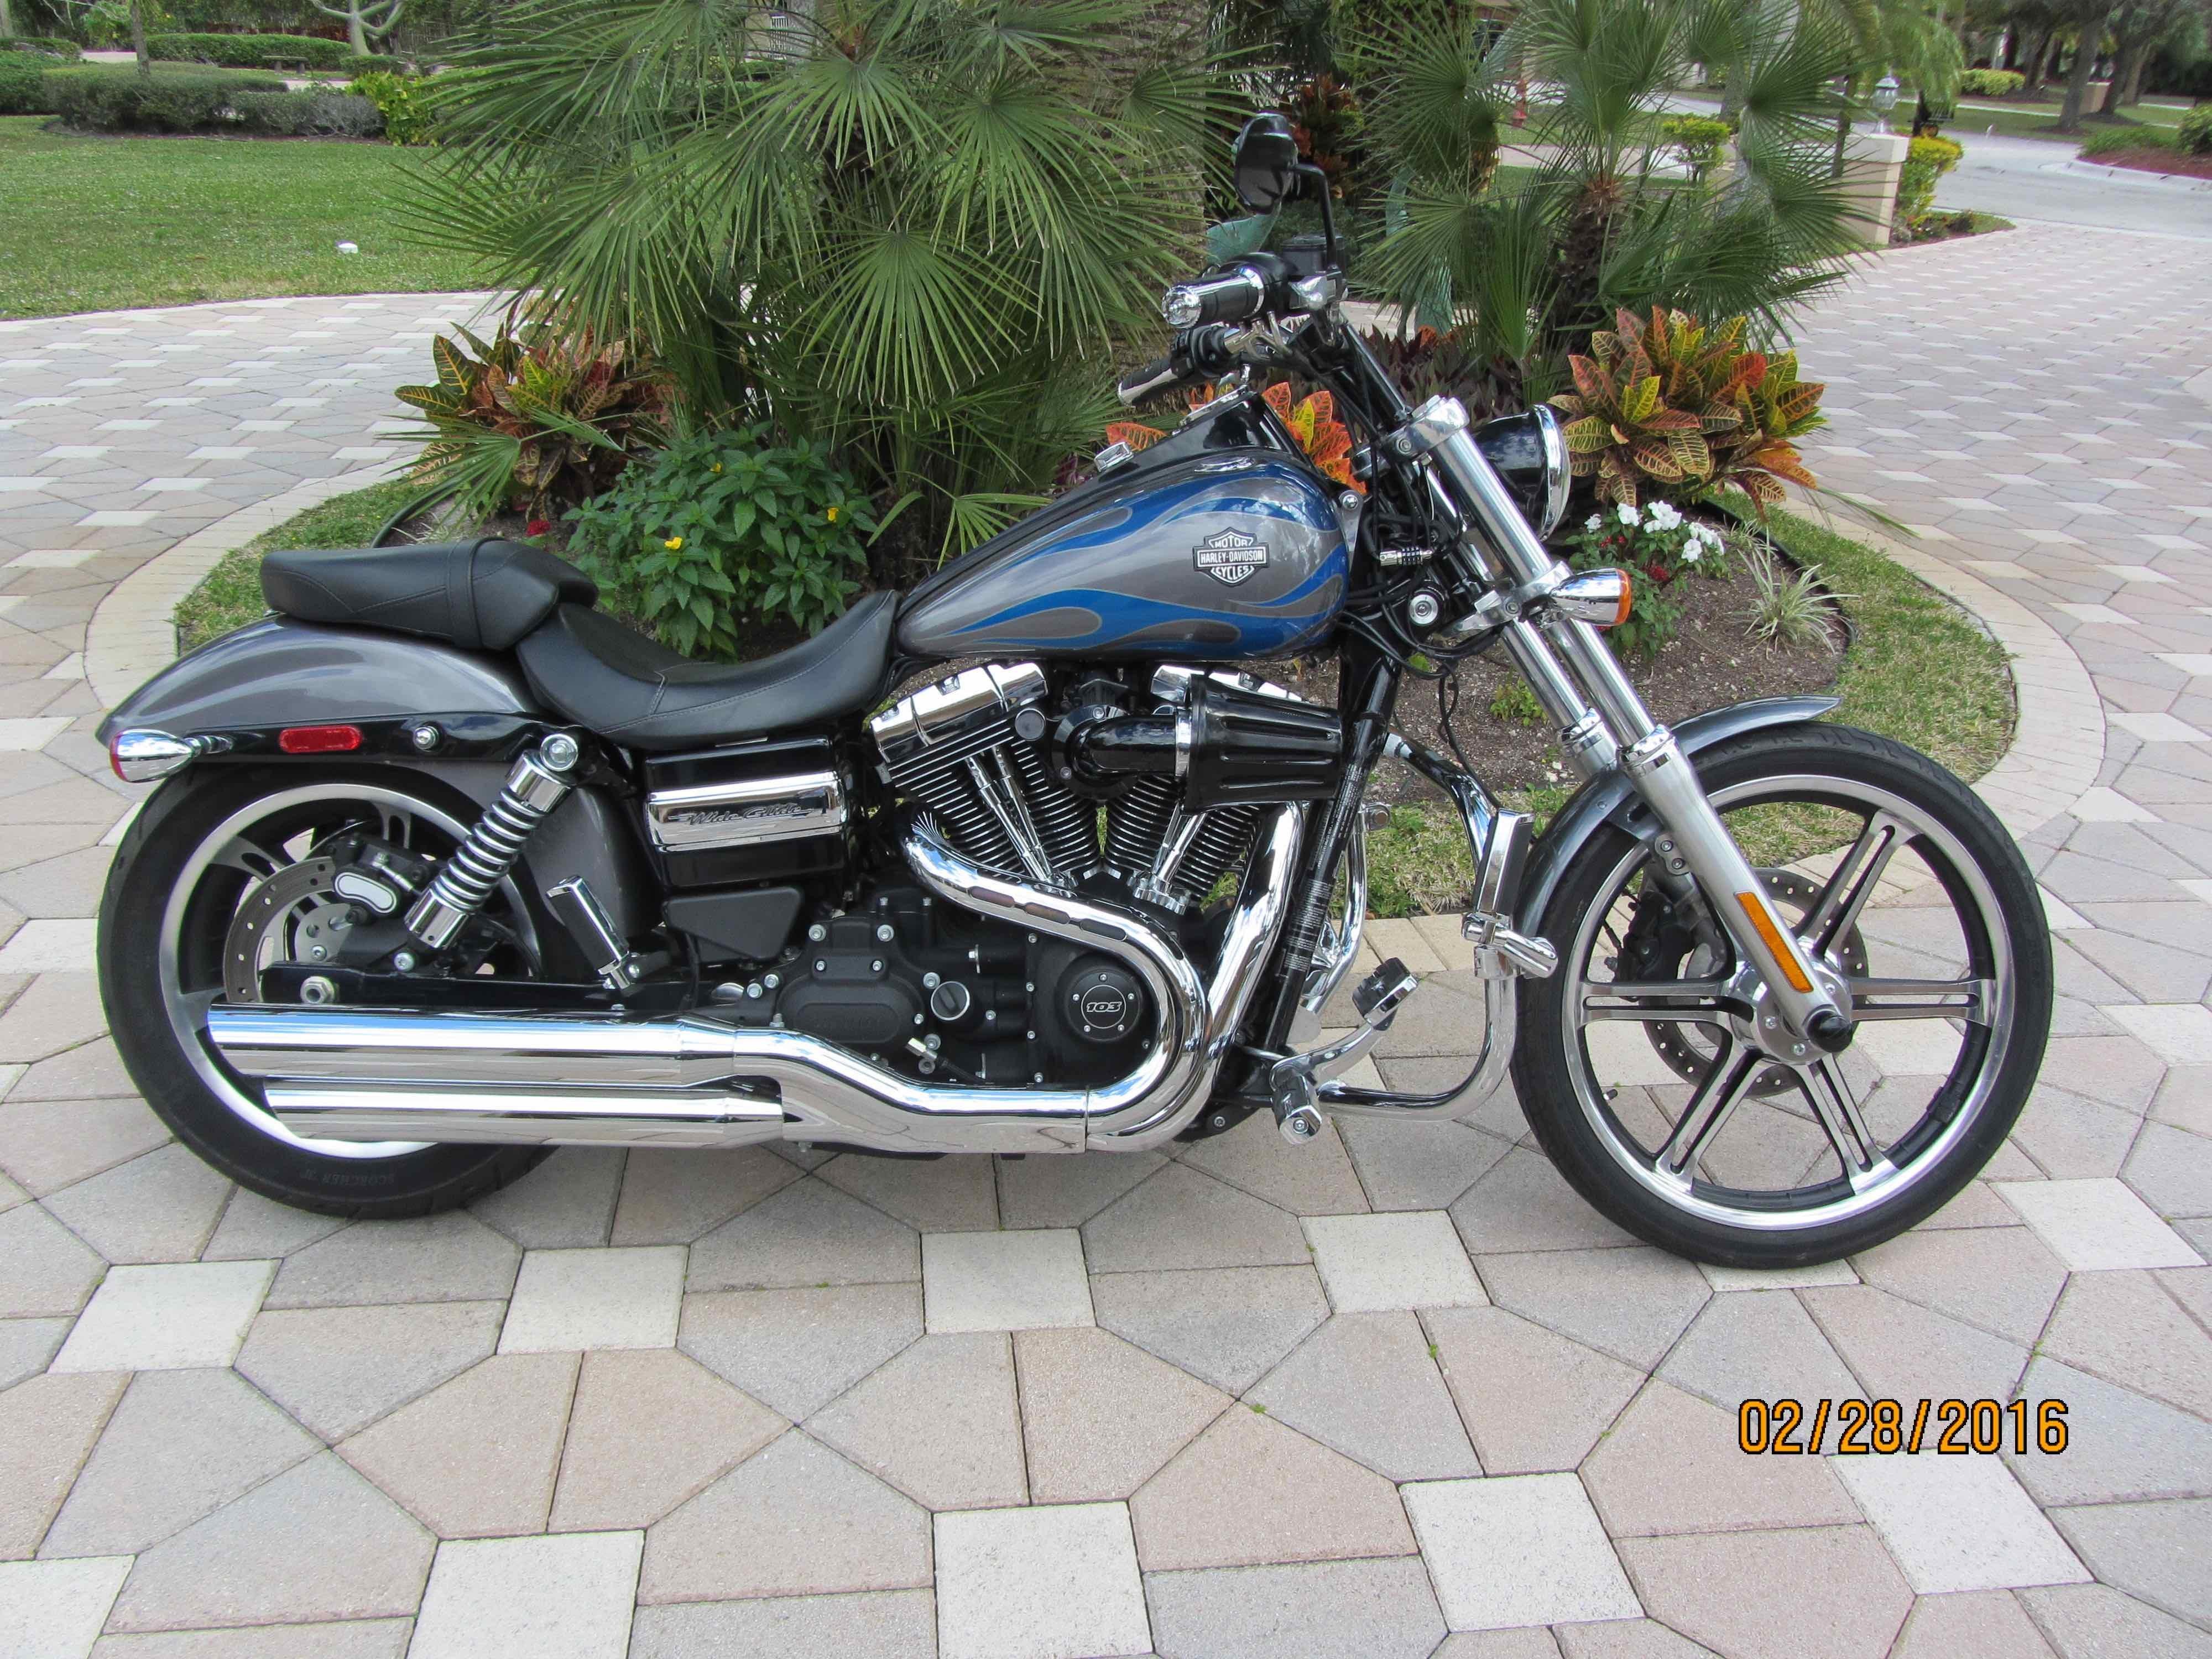 2014 Harley Davidson 174 Fxdwg Dyna 174 Wide Glide 174 Gray Pearl